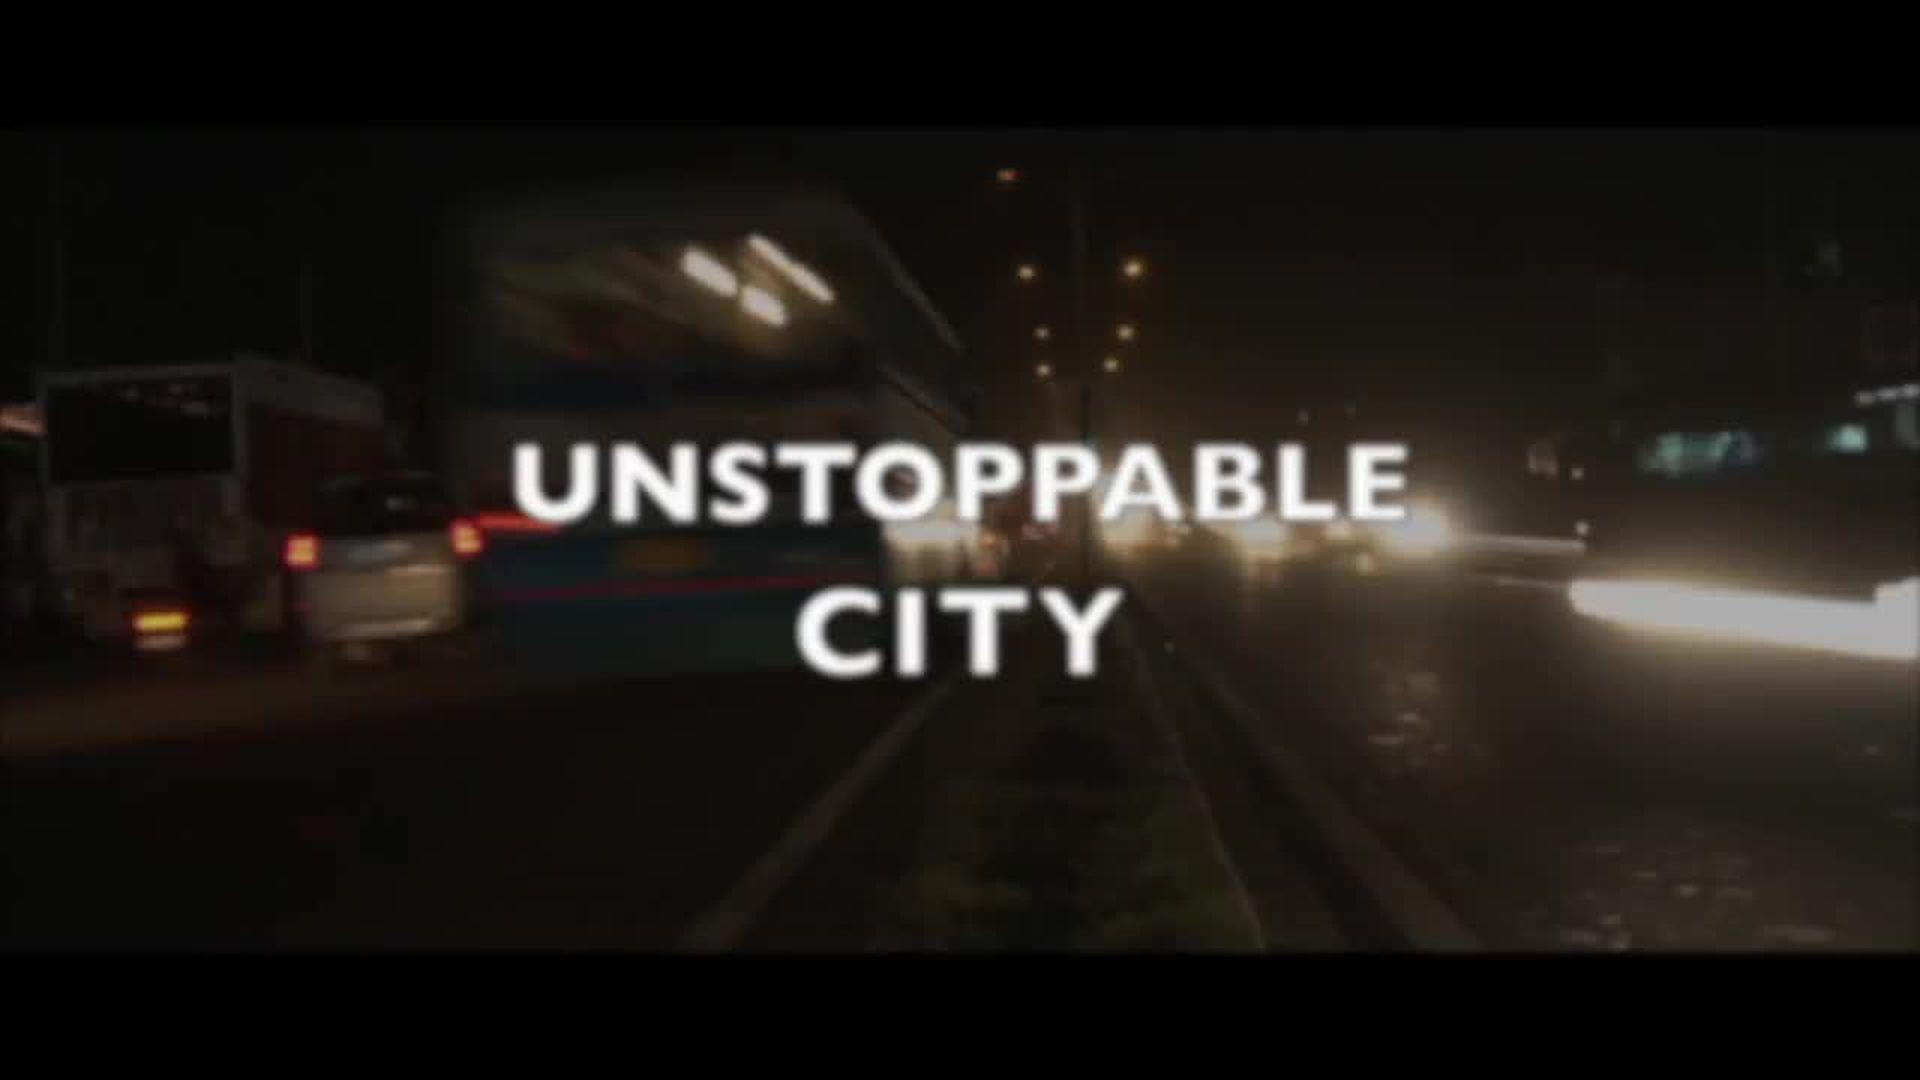 Unstopable, City